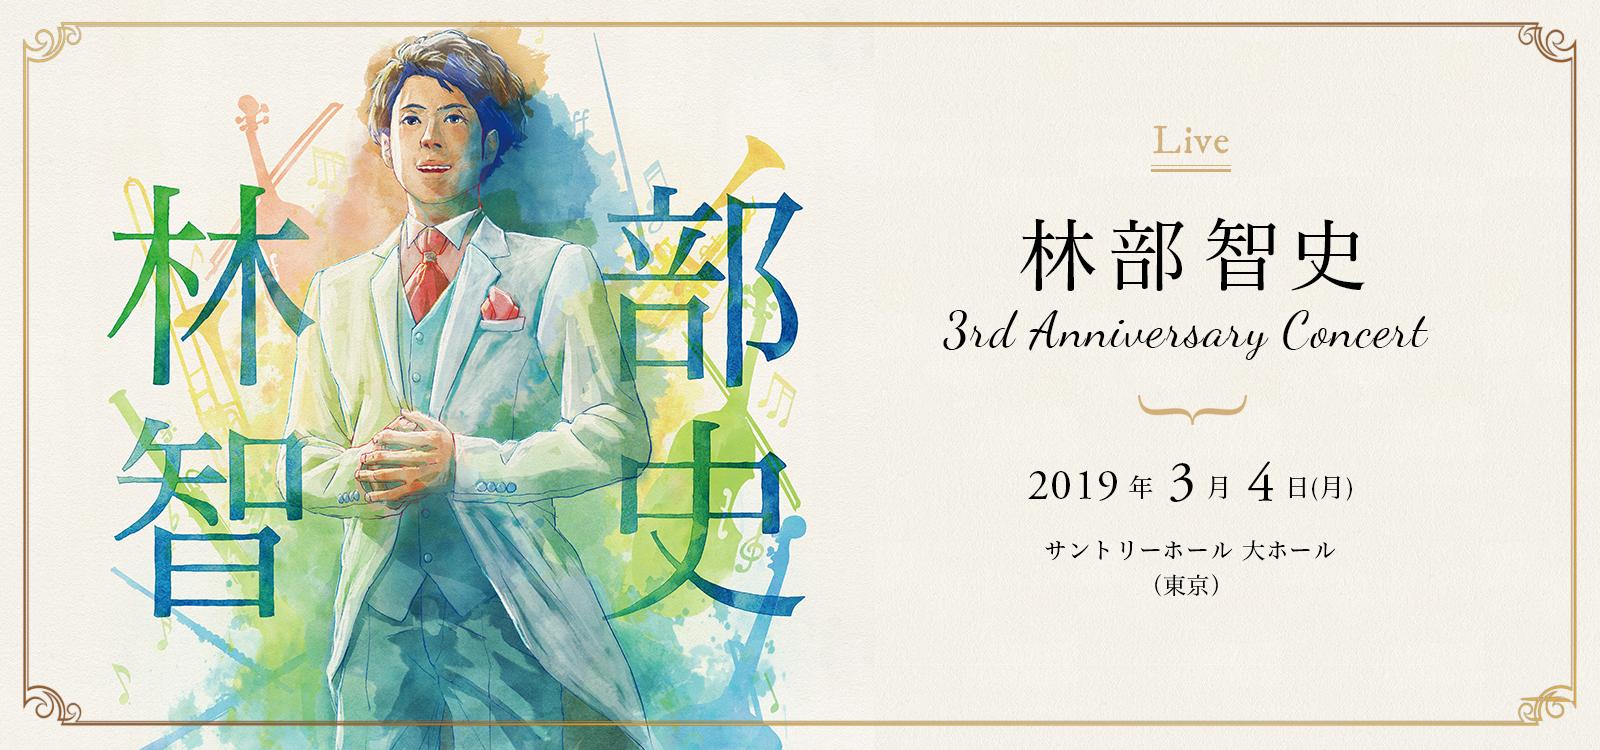 林部智史 3rd Anniversary Concert